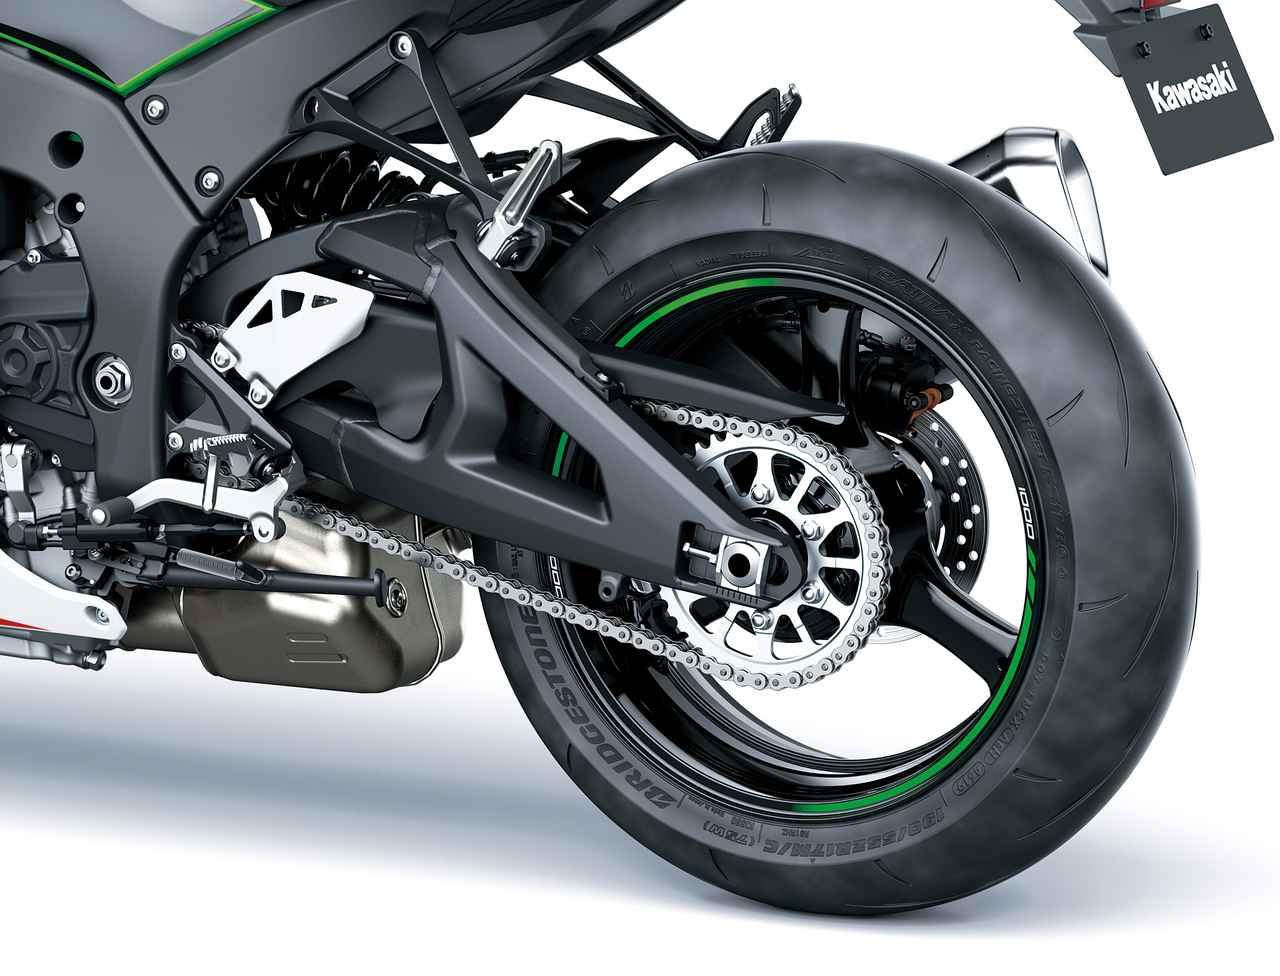 Images : 9番目の画像 - 【写真10枚】カワサキ新型「Ninja ZX-10R」 - webオートバイ